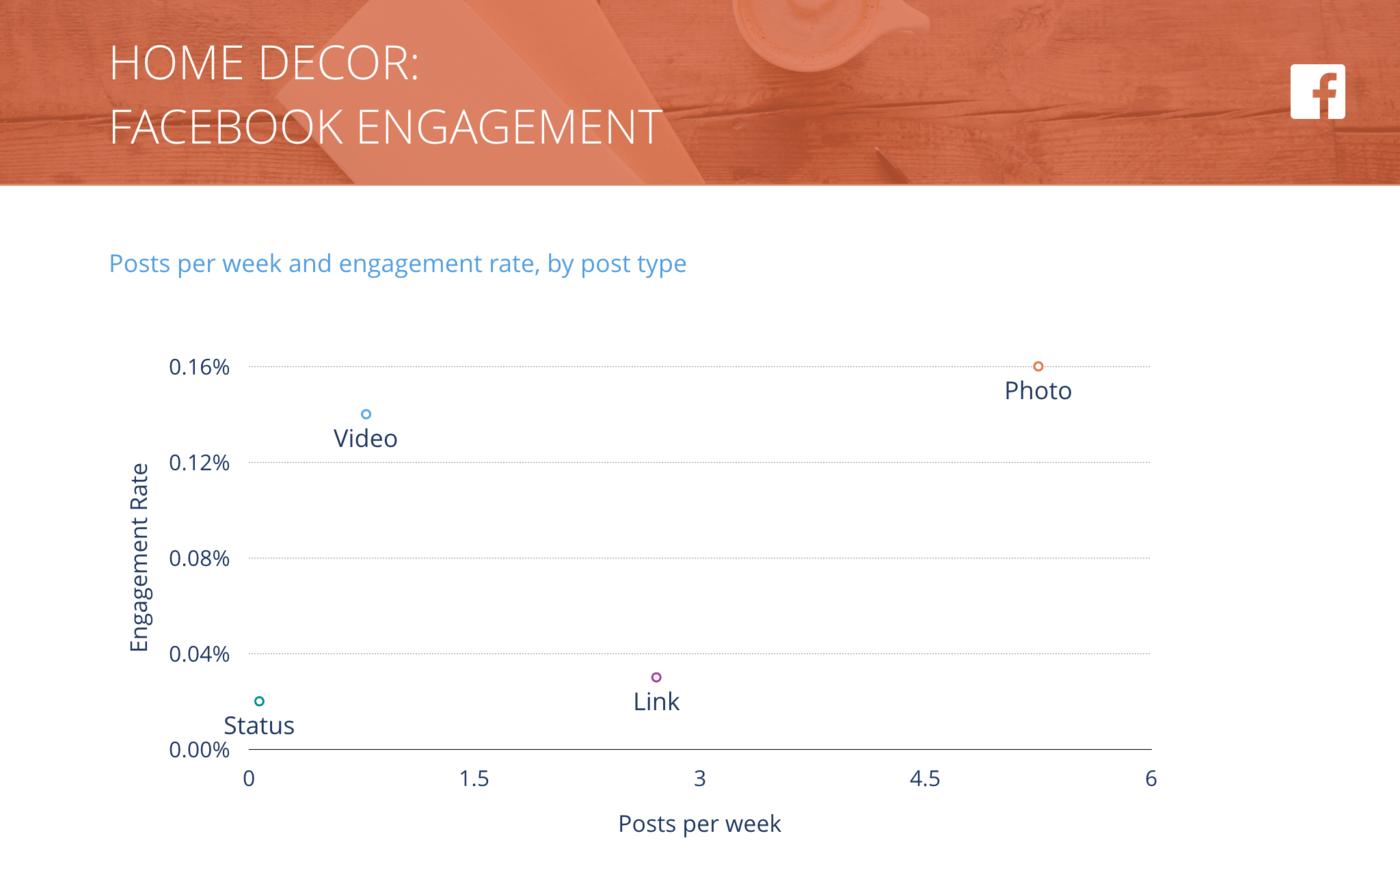 slide for Facebook Posts per Week vs. Engagement Rate per Post, Home Decor